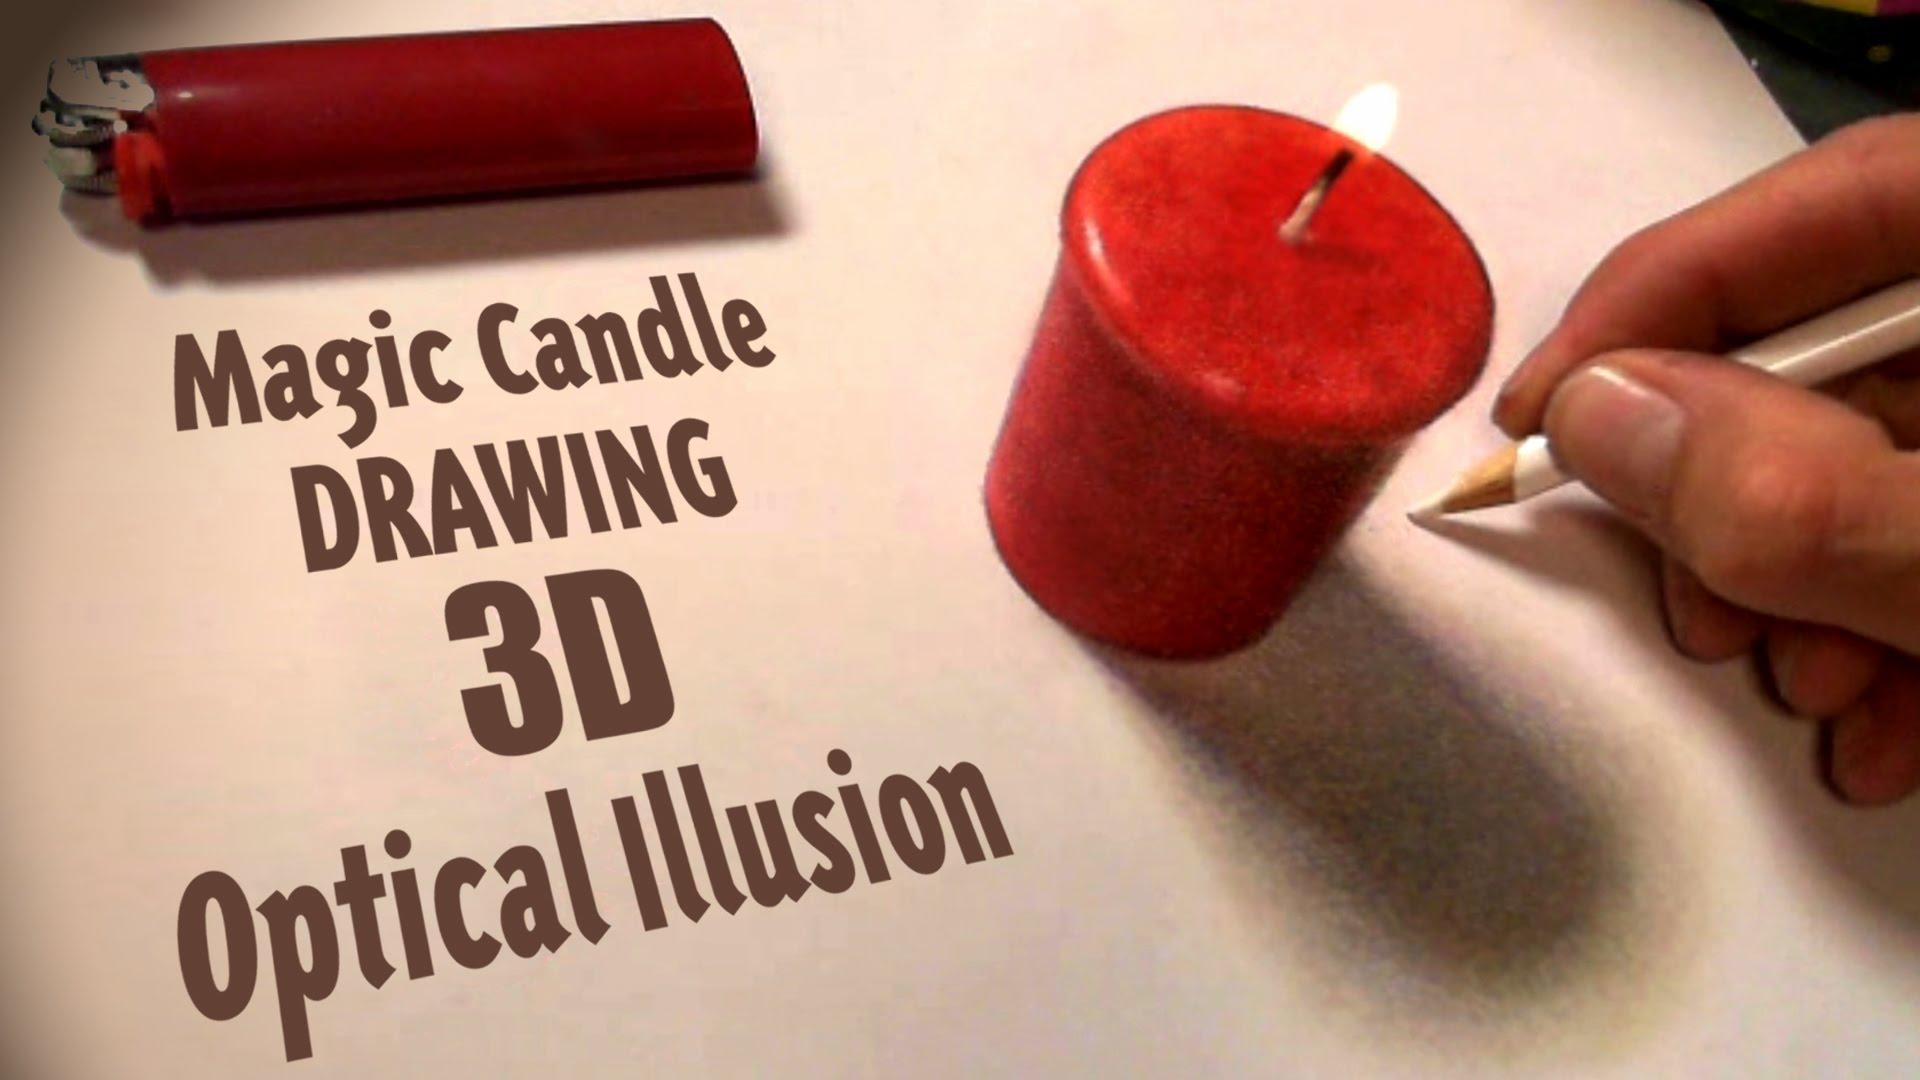 Drawn optical illusion ice A Drawing Magic 3D Art